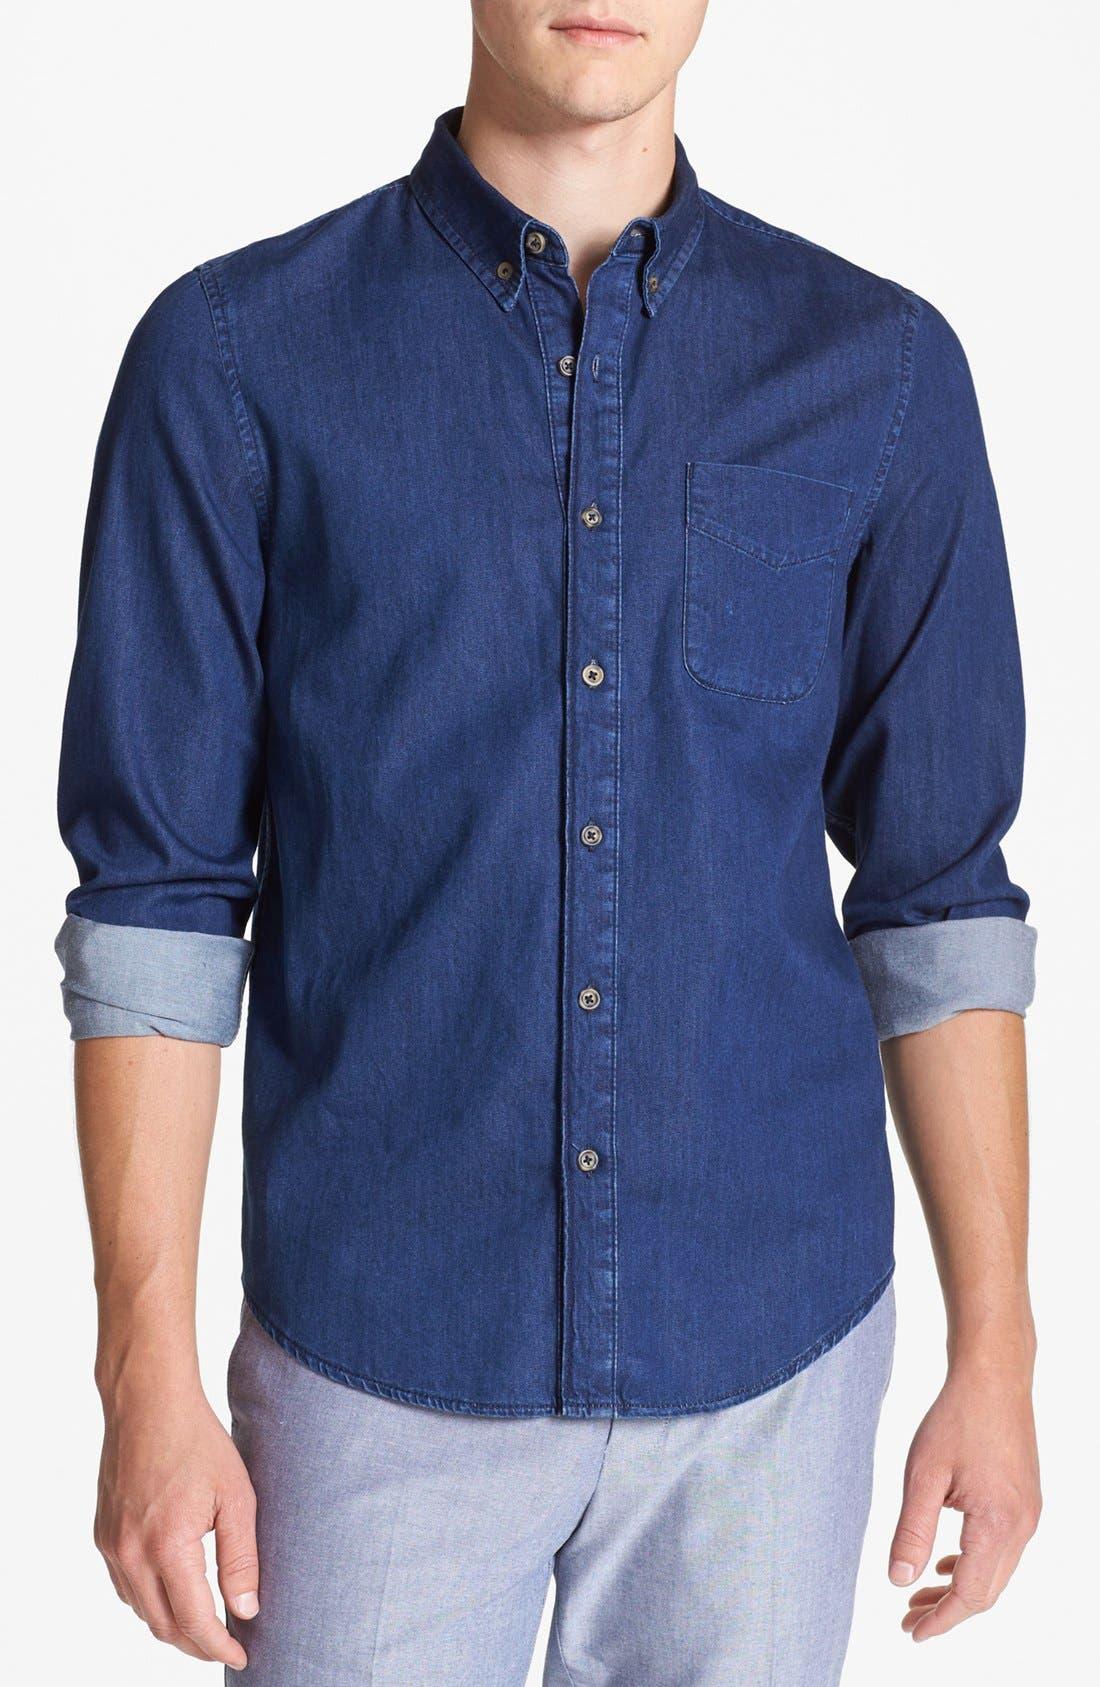 Alternate Image 1 Selected - Topman Indigo Shirt